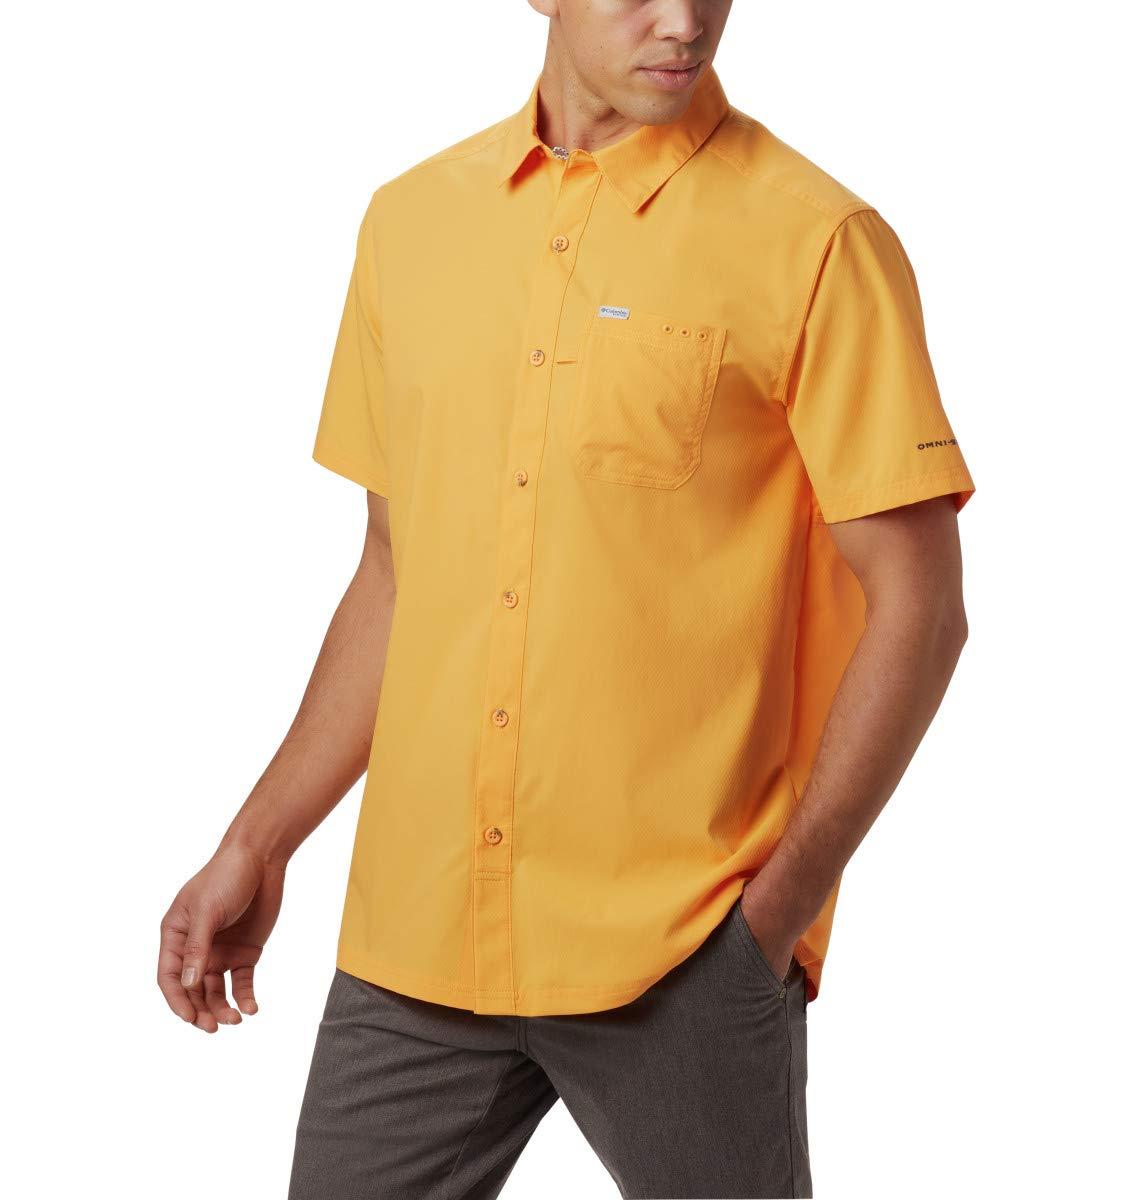 Columbia Men's Slack Tide Camp Shirt, Summer Orange, Large by Columbia